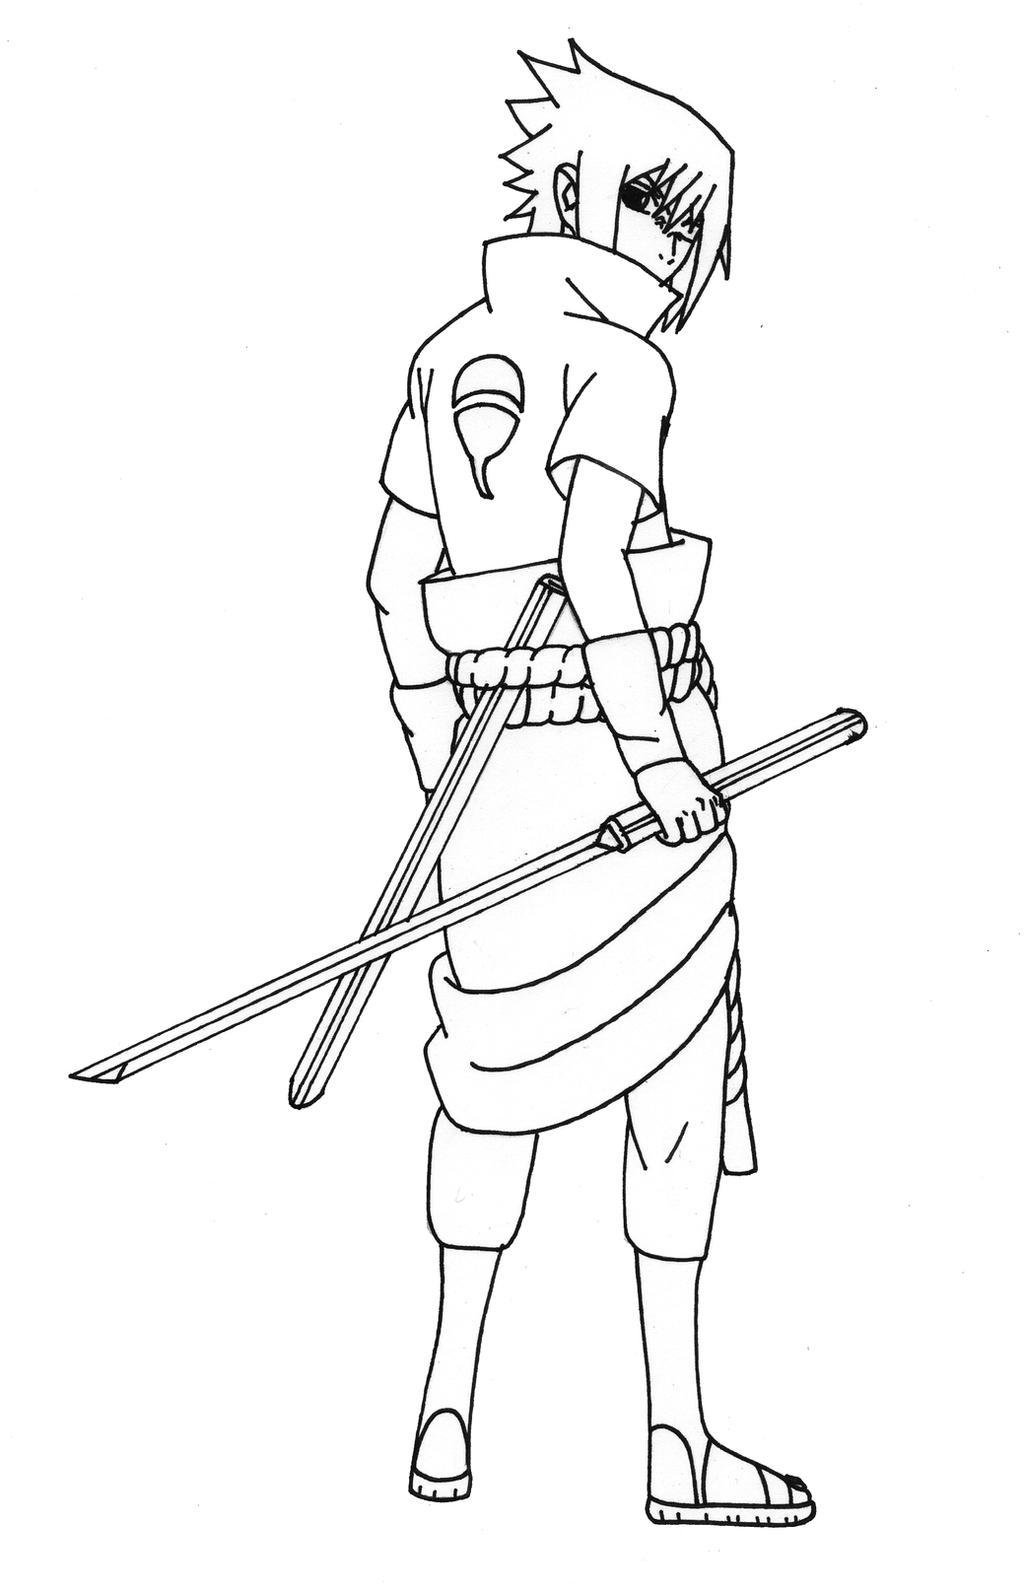 Sasuke Shippuden [Taka] by cheygipe